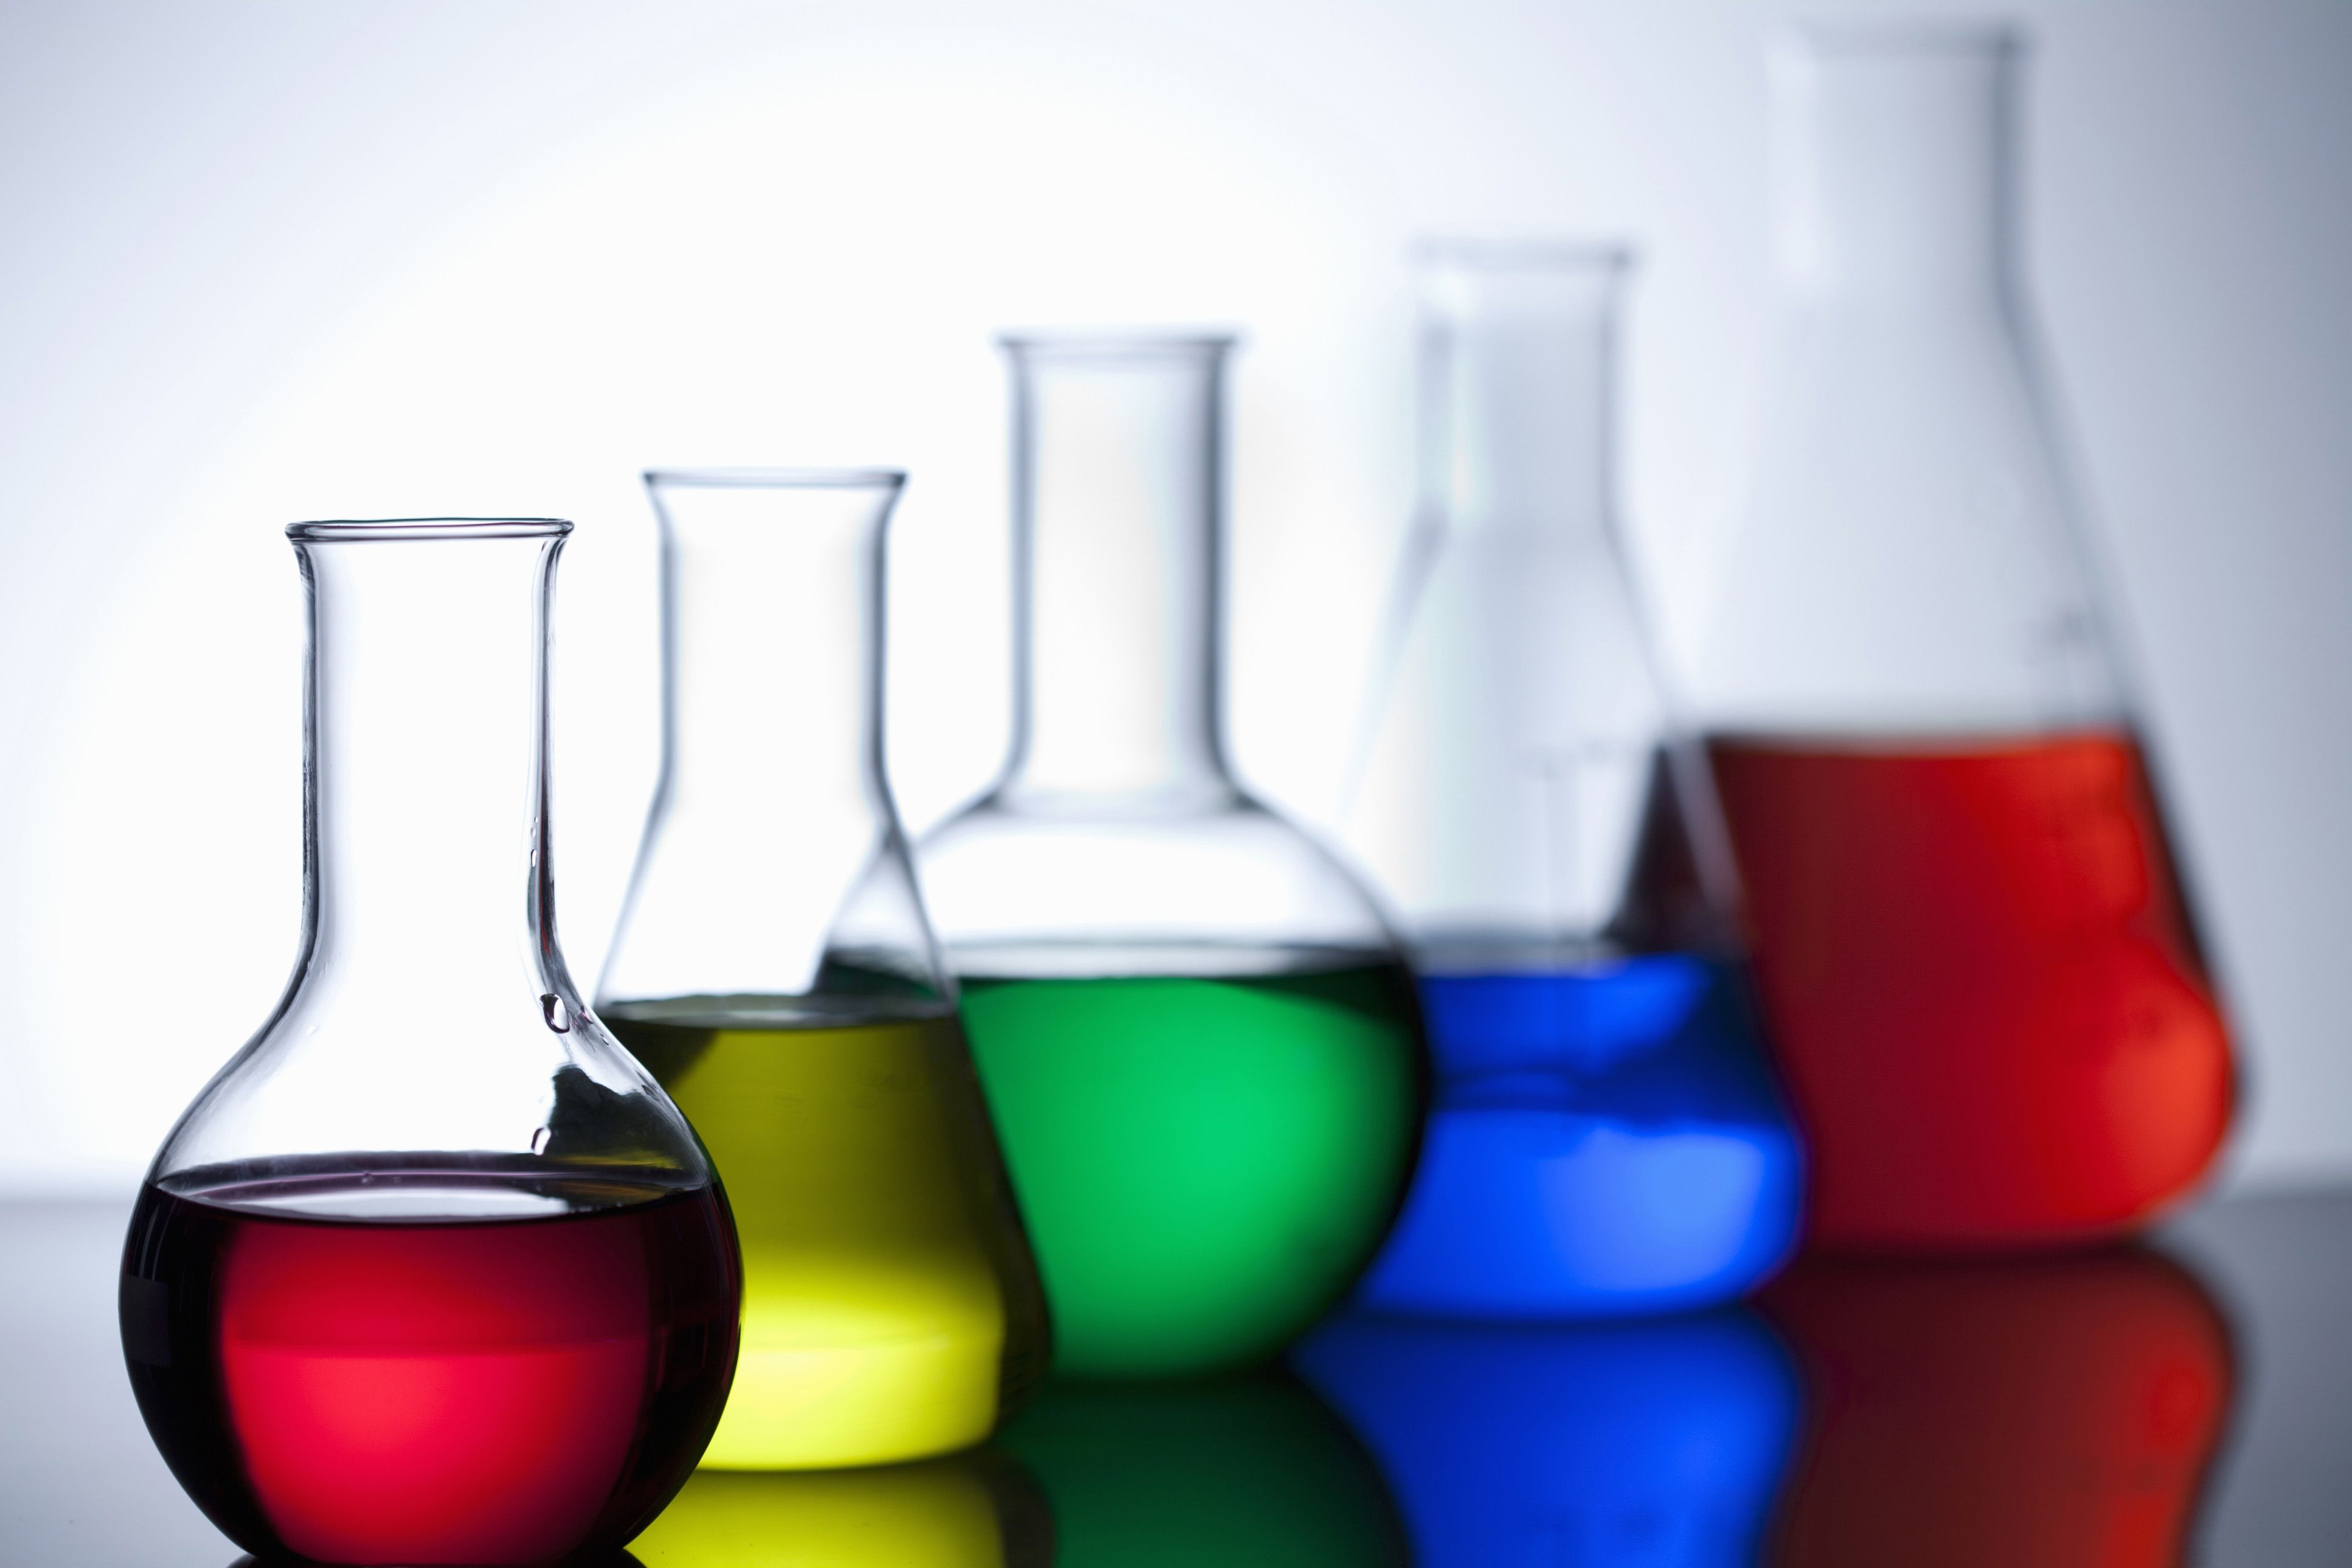 Chemistry glassware 56a12a083df78cf772680235 1